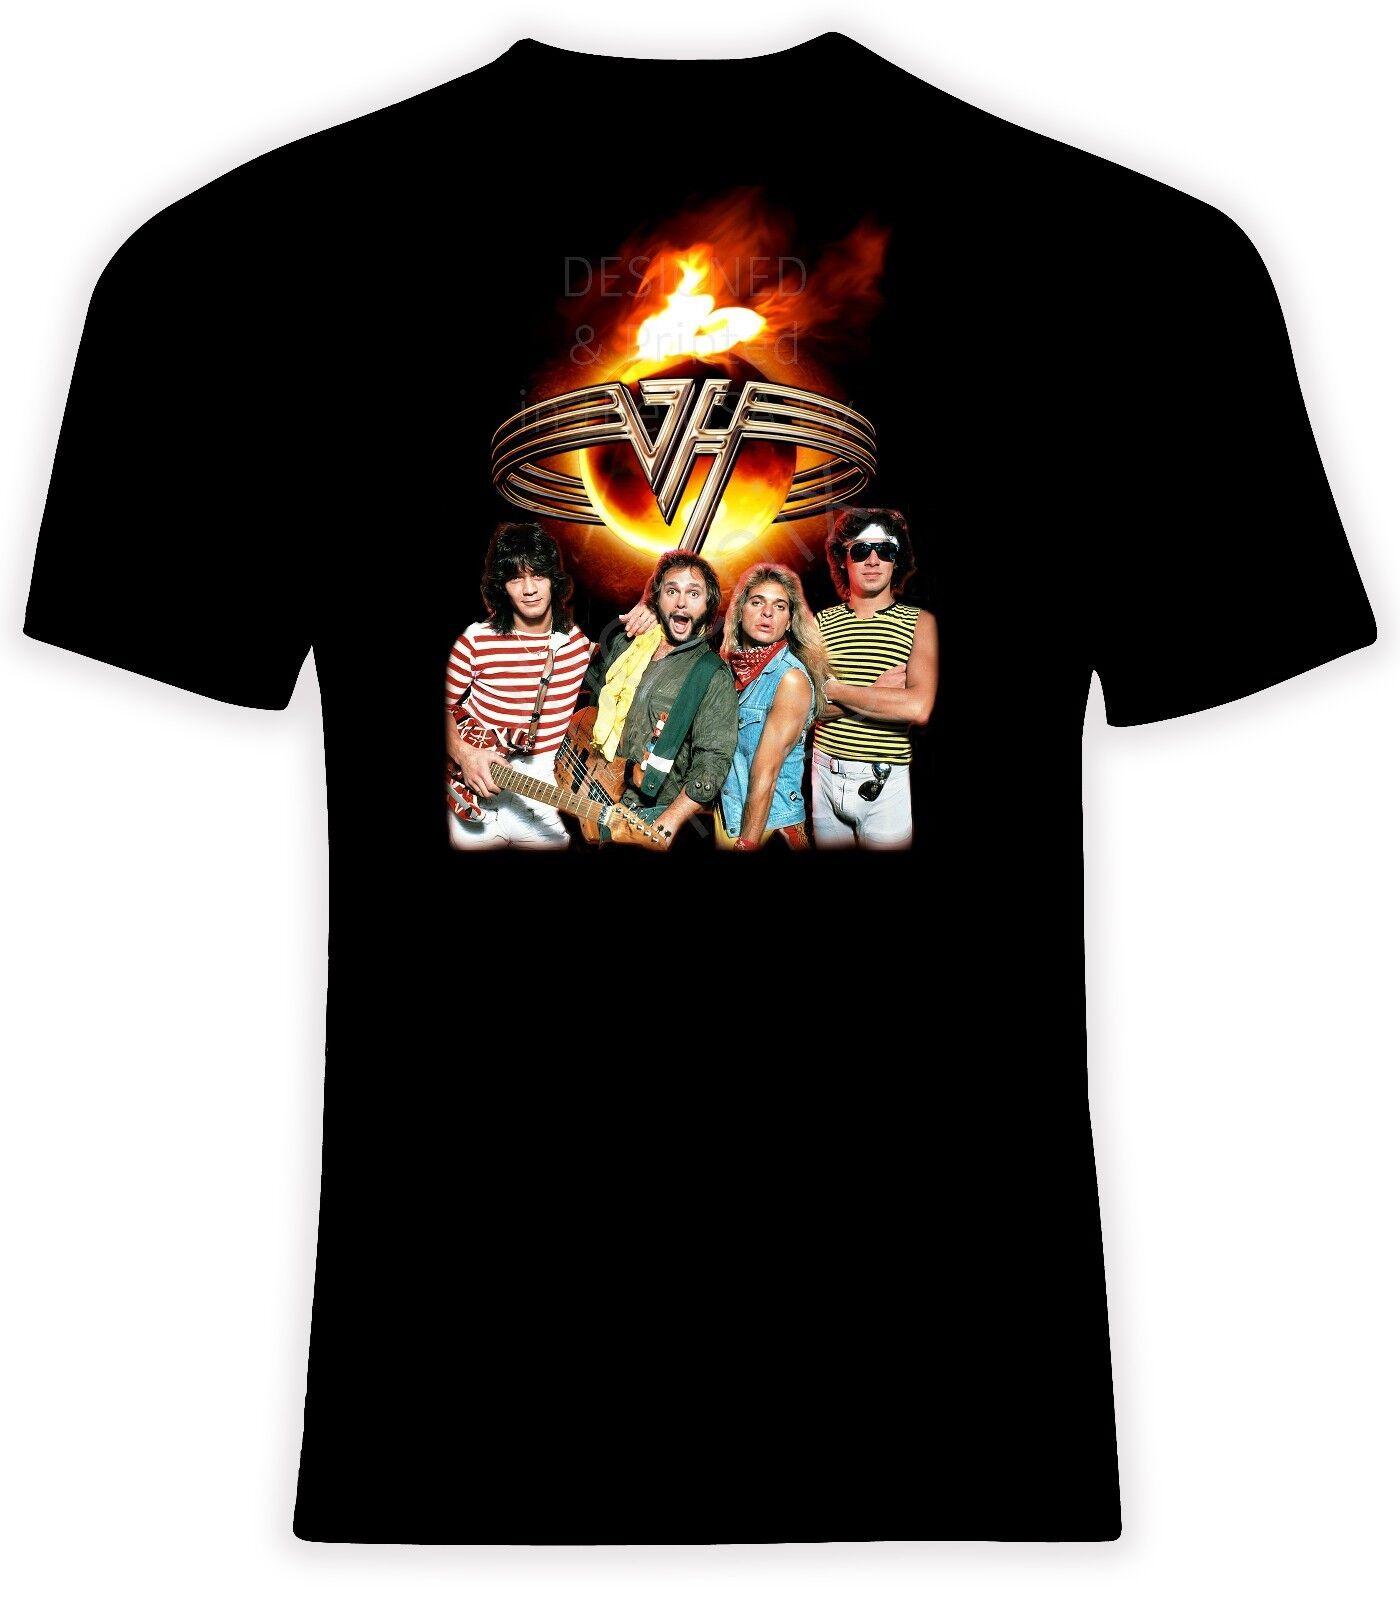 Van Halen with David Lee Roth T shirt, Größes S-6X, Short or Long Sleeve